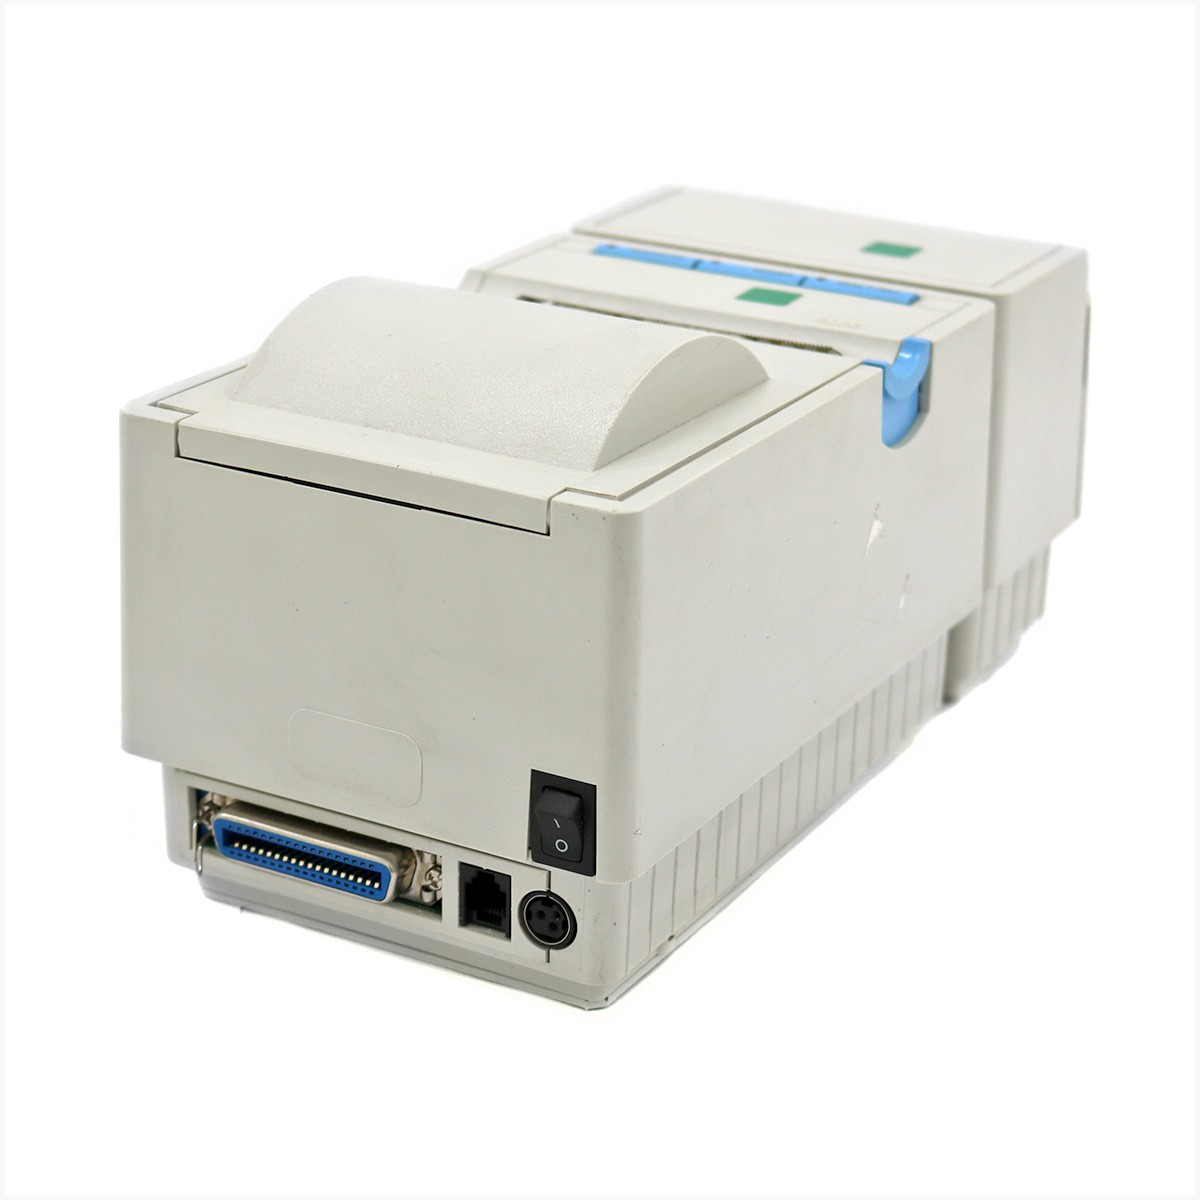 Impressora Perto Printer Autenticadora